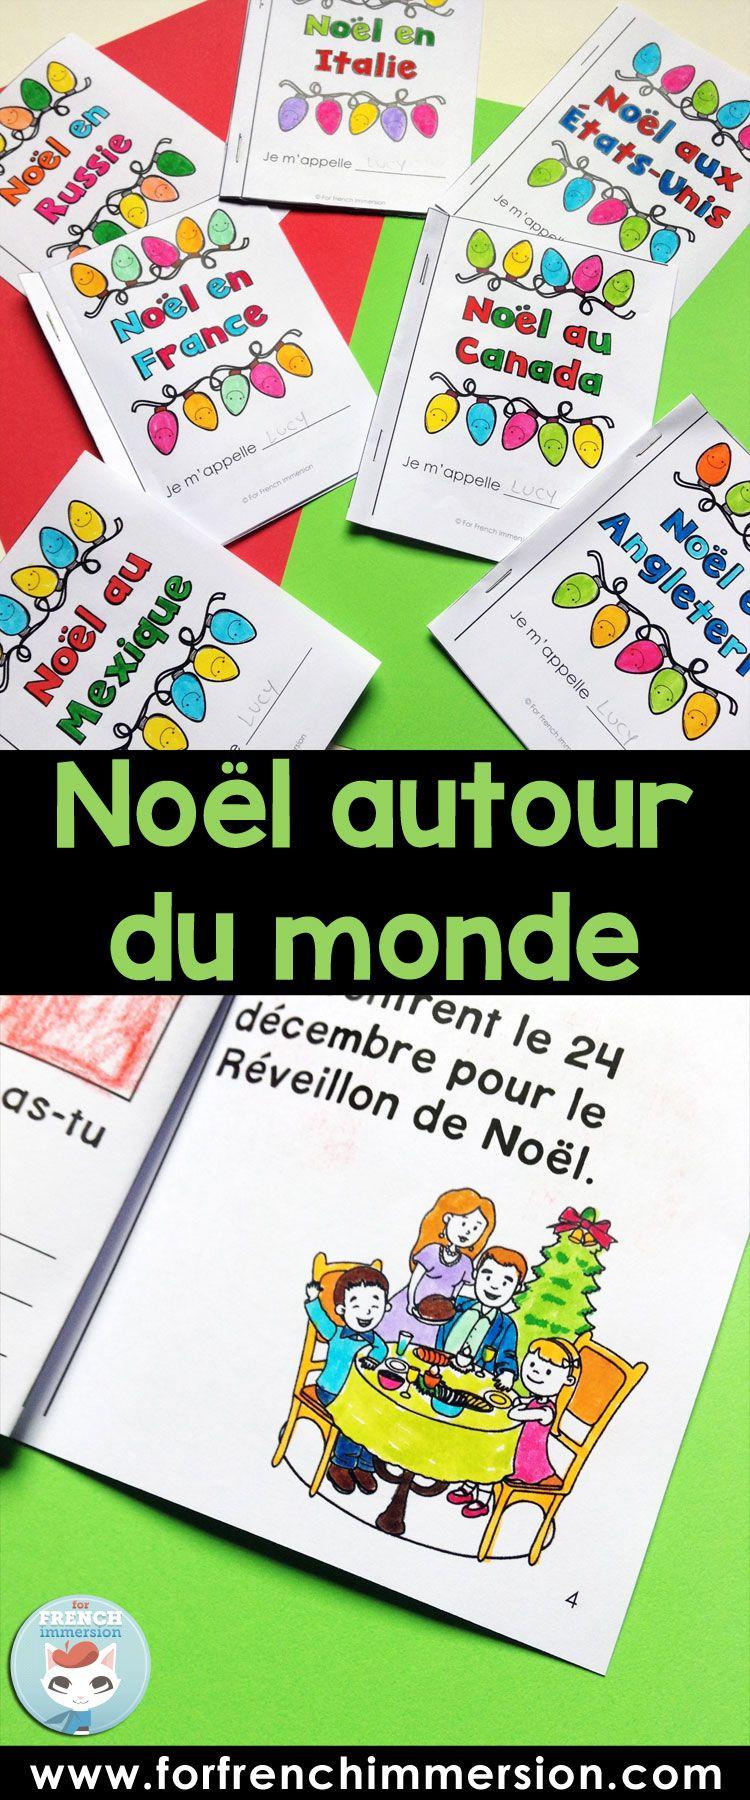 Nol autour du monde Christmas around the world French resource